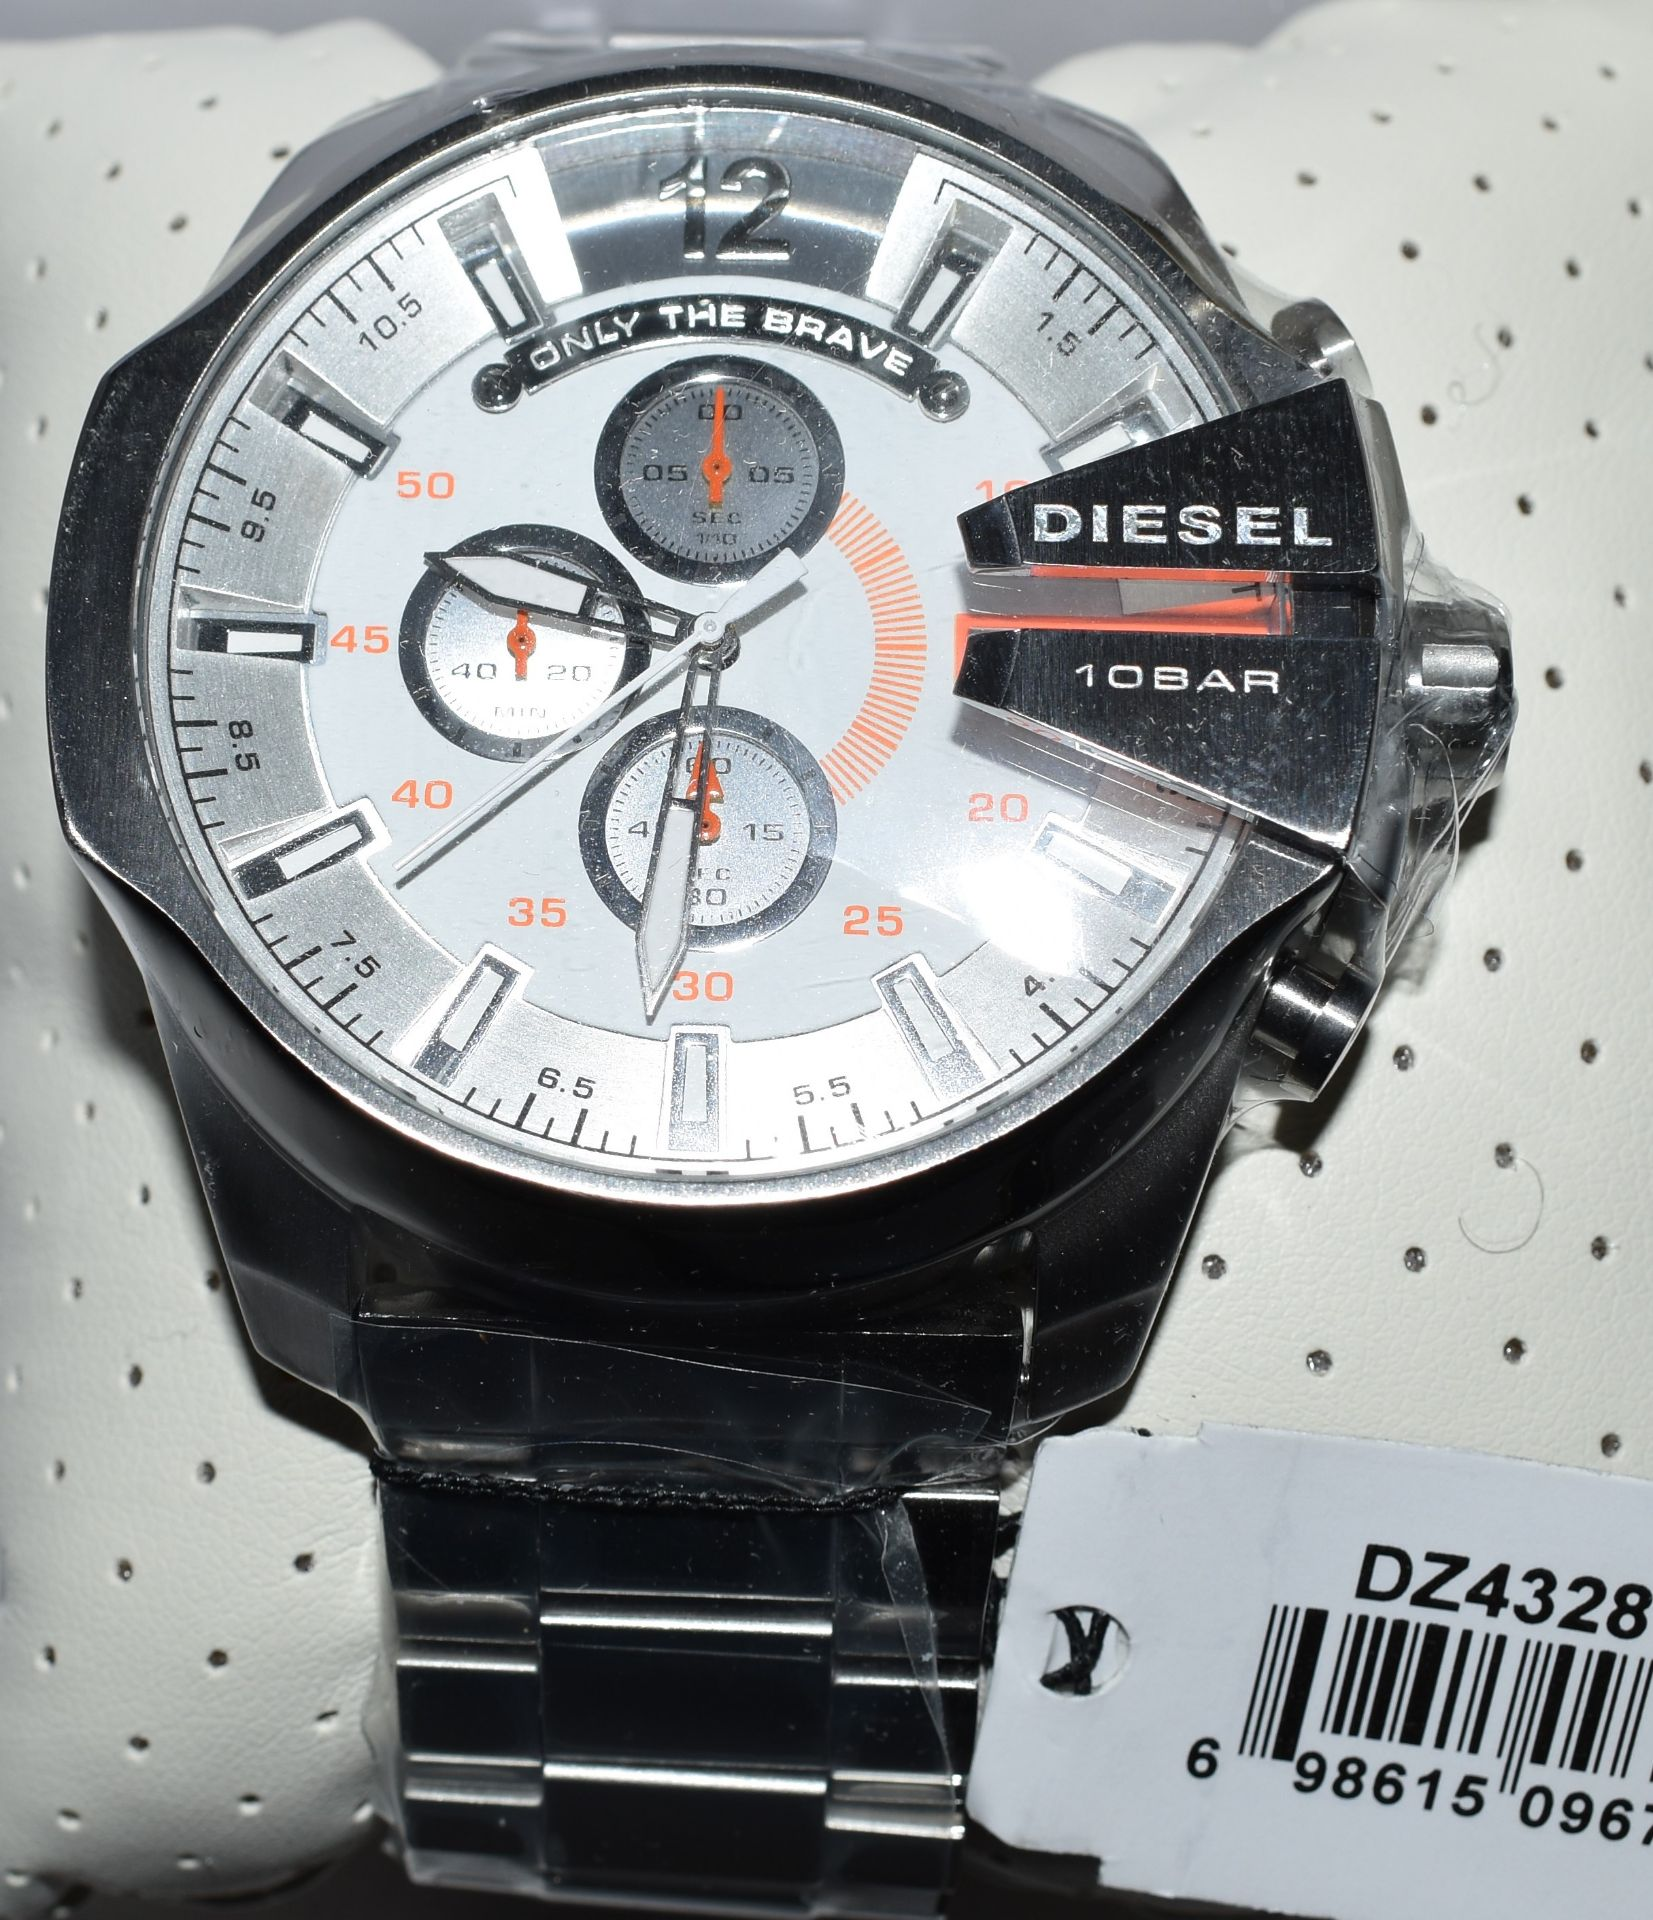 Diesel Men's Watch DZ4328 - Image 3 of 3